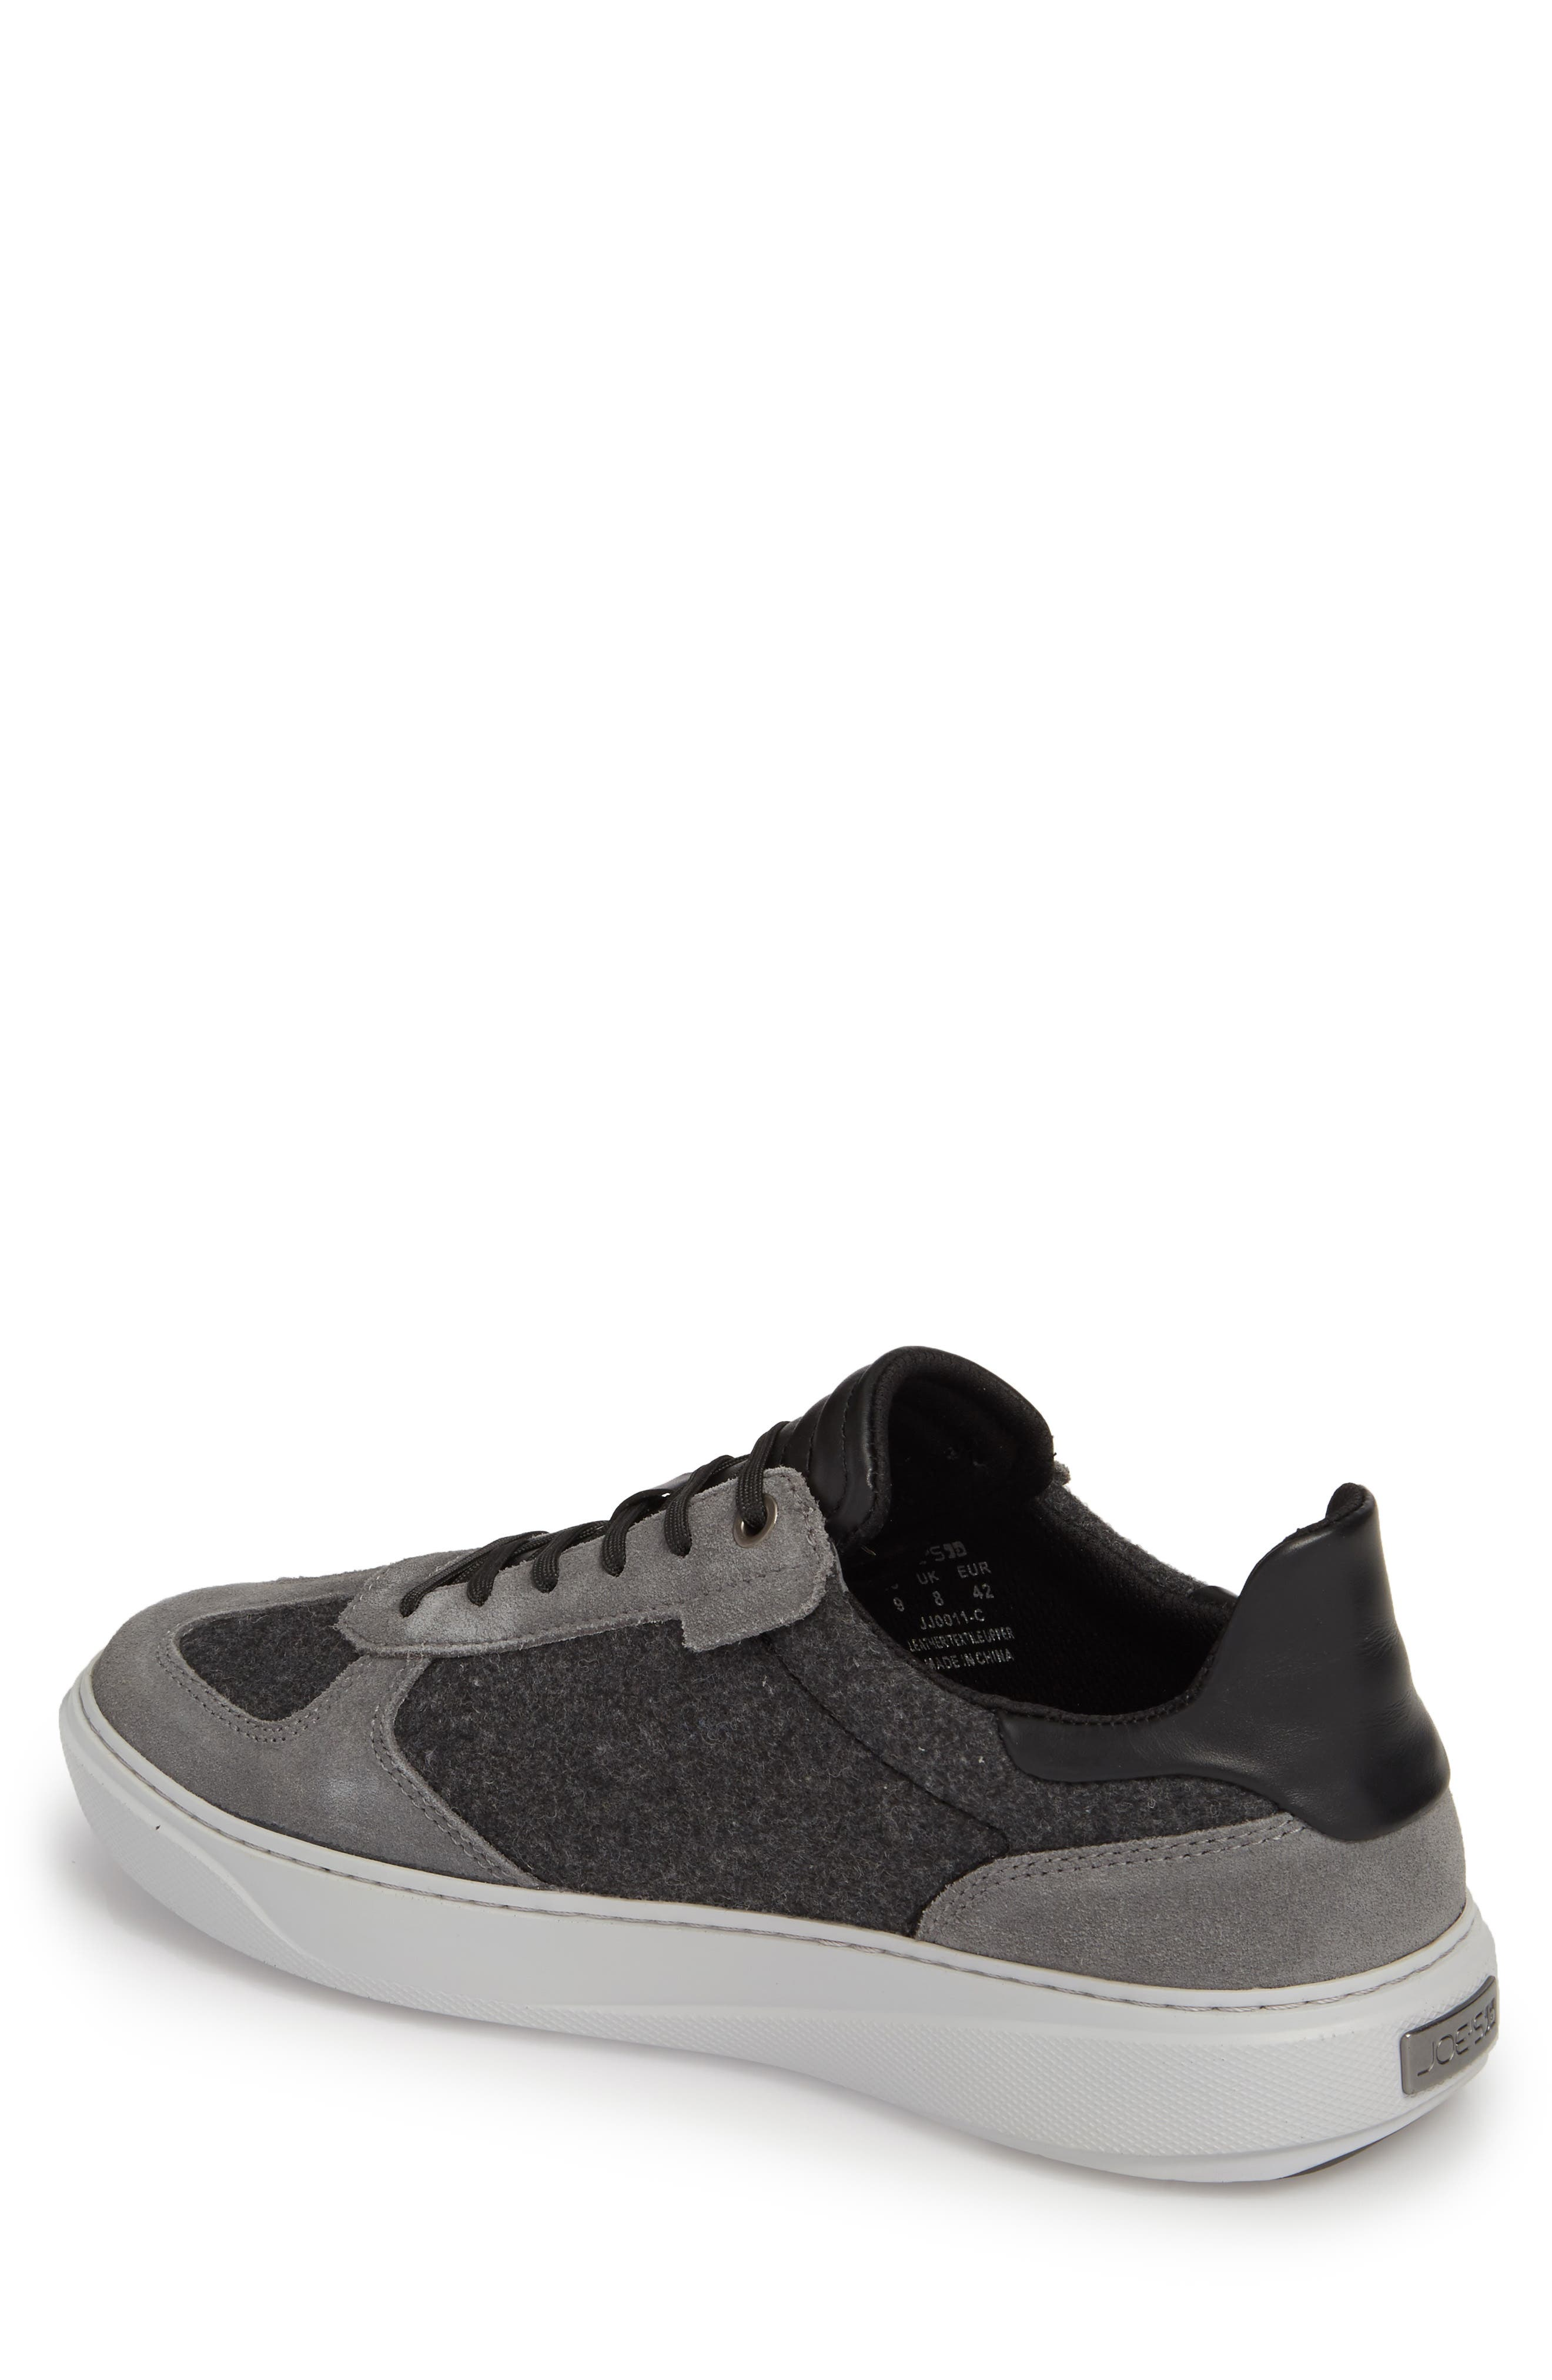 Mo Joe Sneaker,                             Alternate thumbnail 2, color,                             Charcoal Wool/ Suede